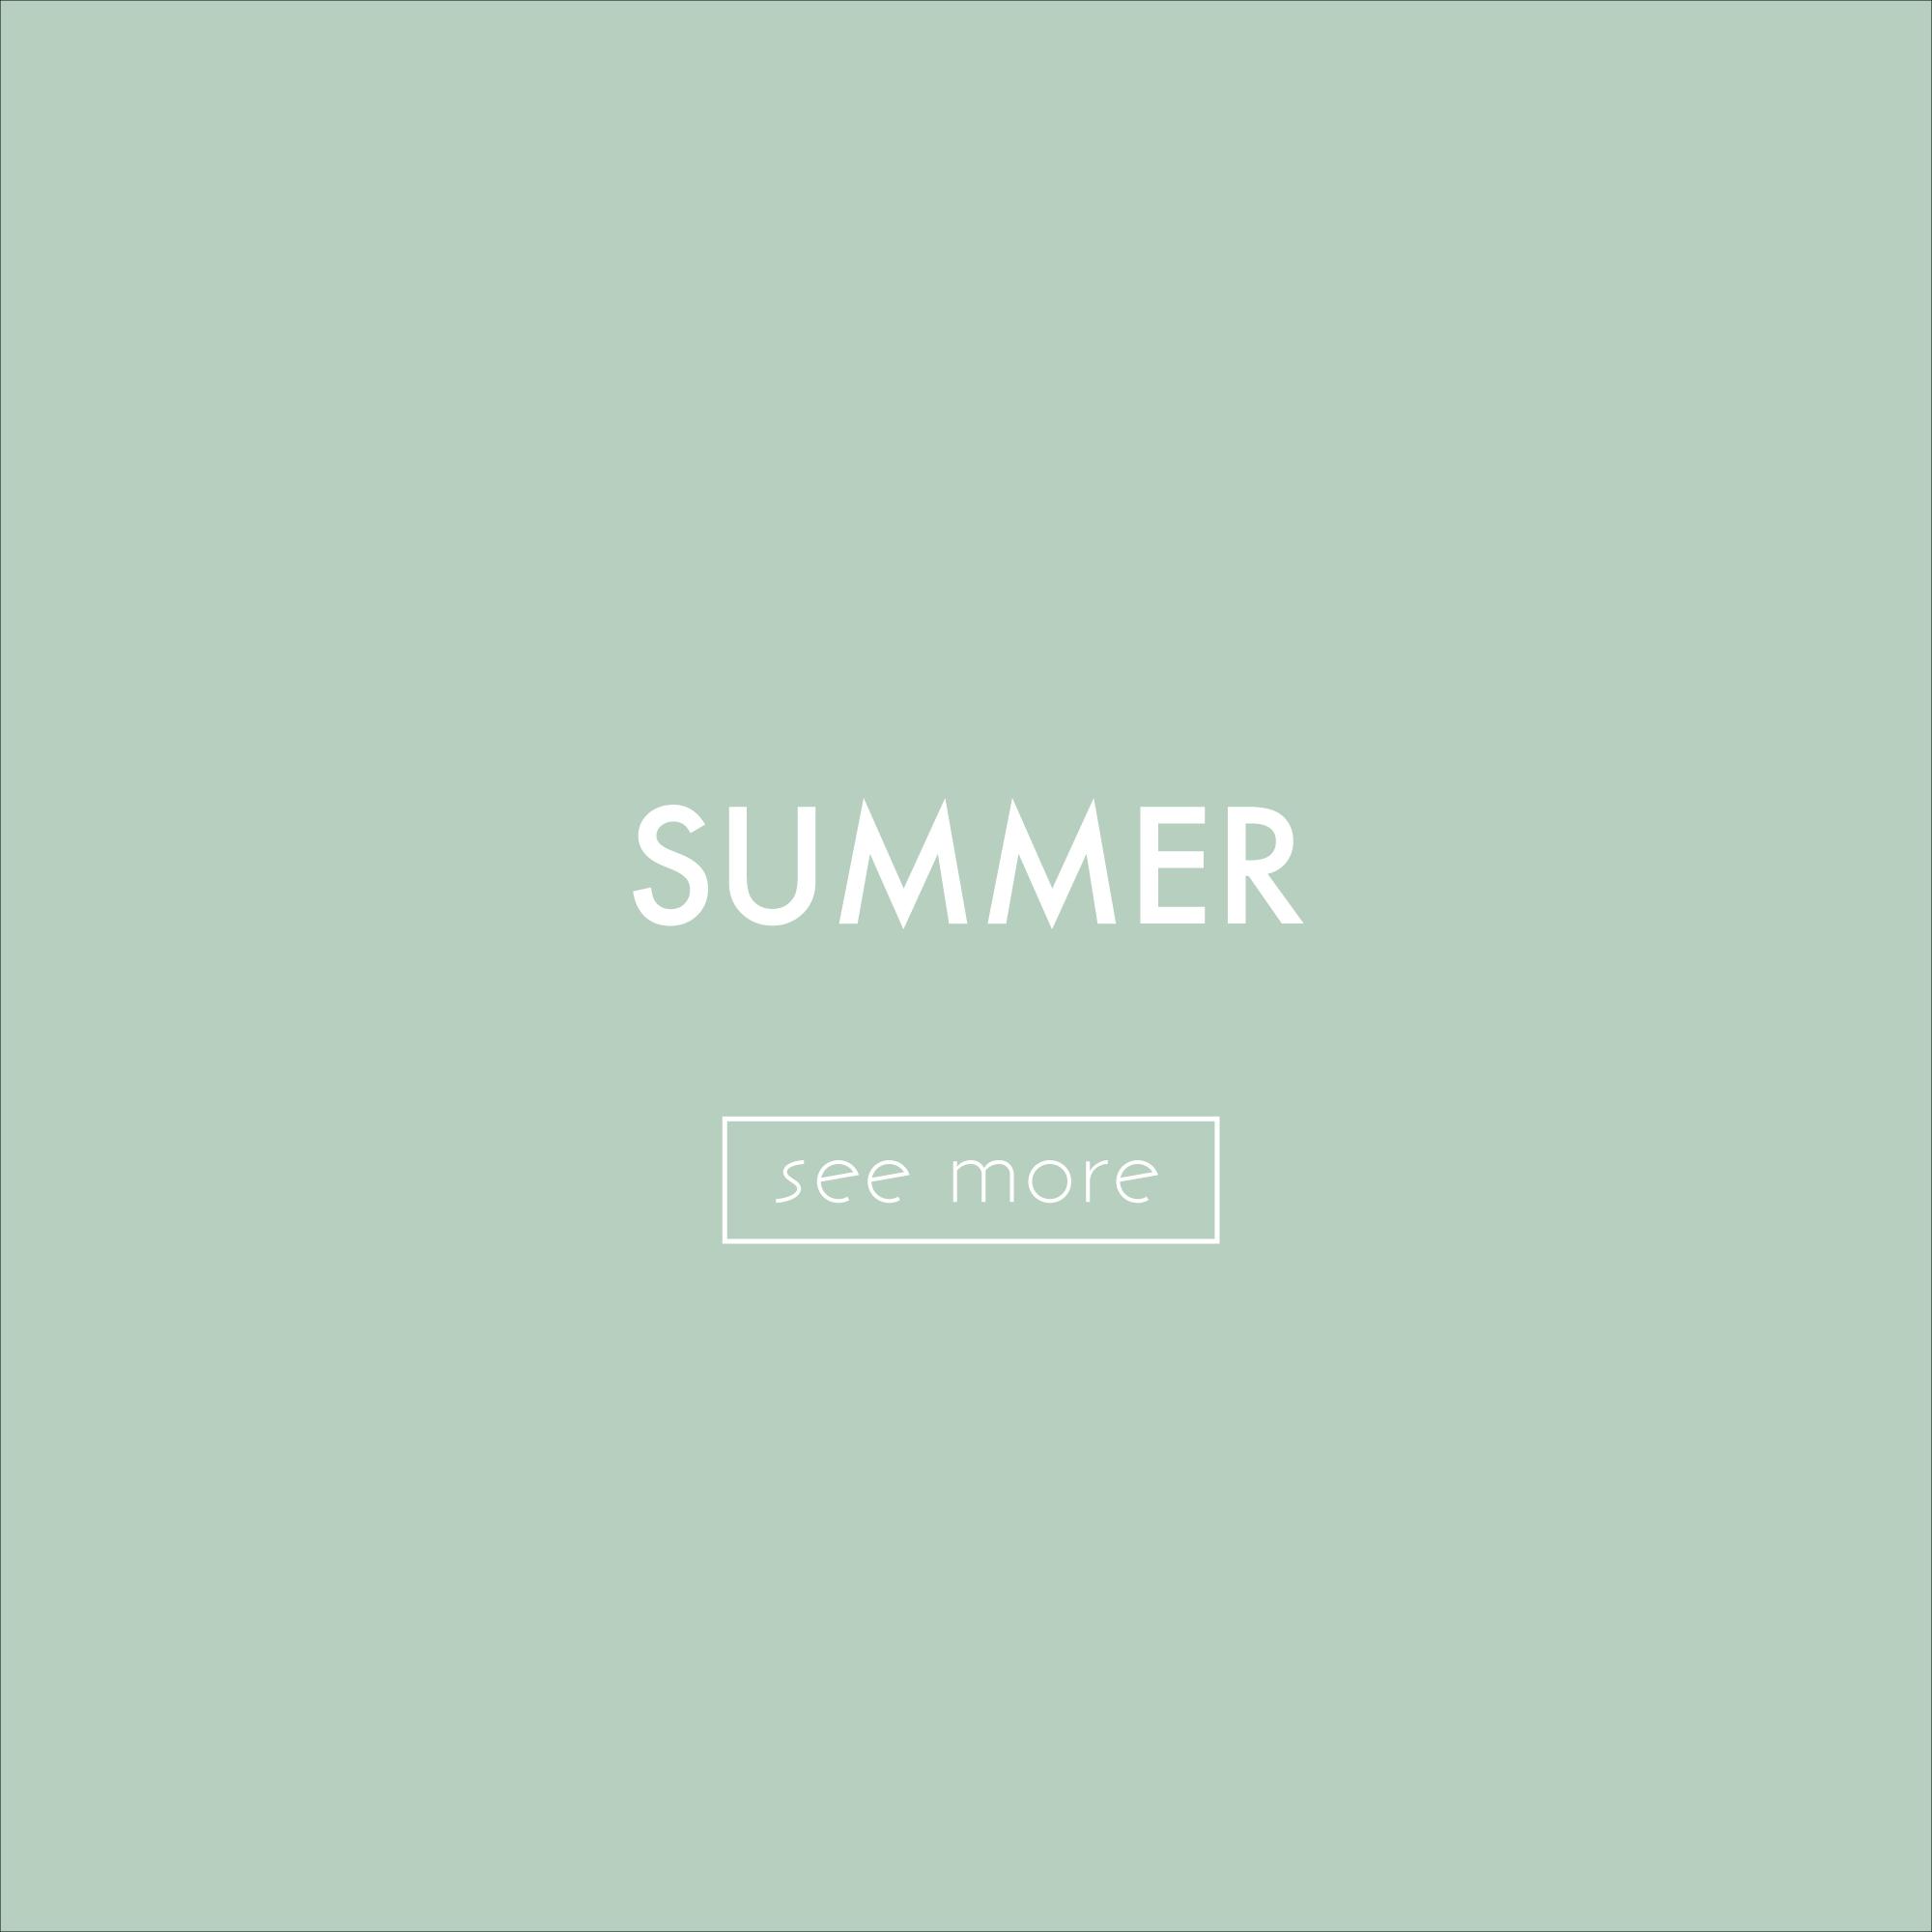 F&F-summer.png